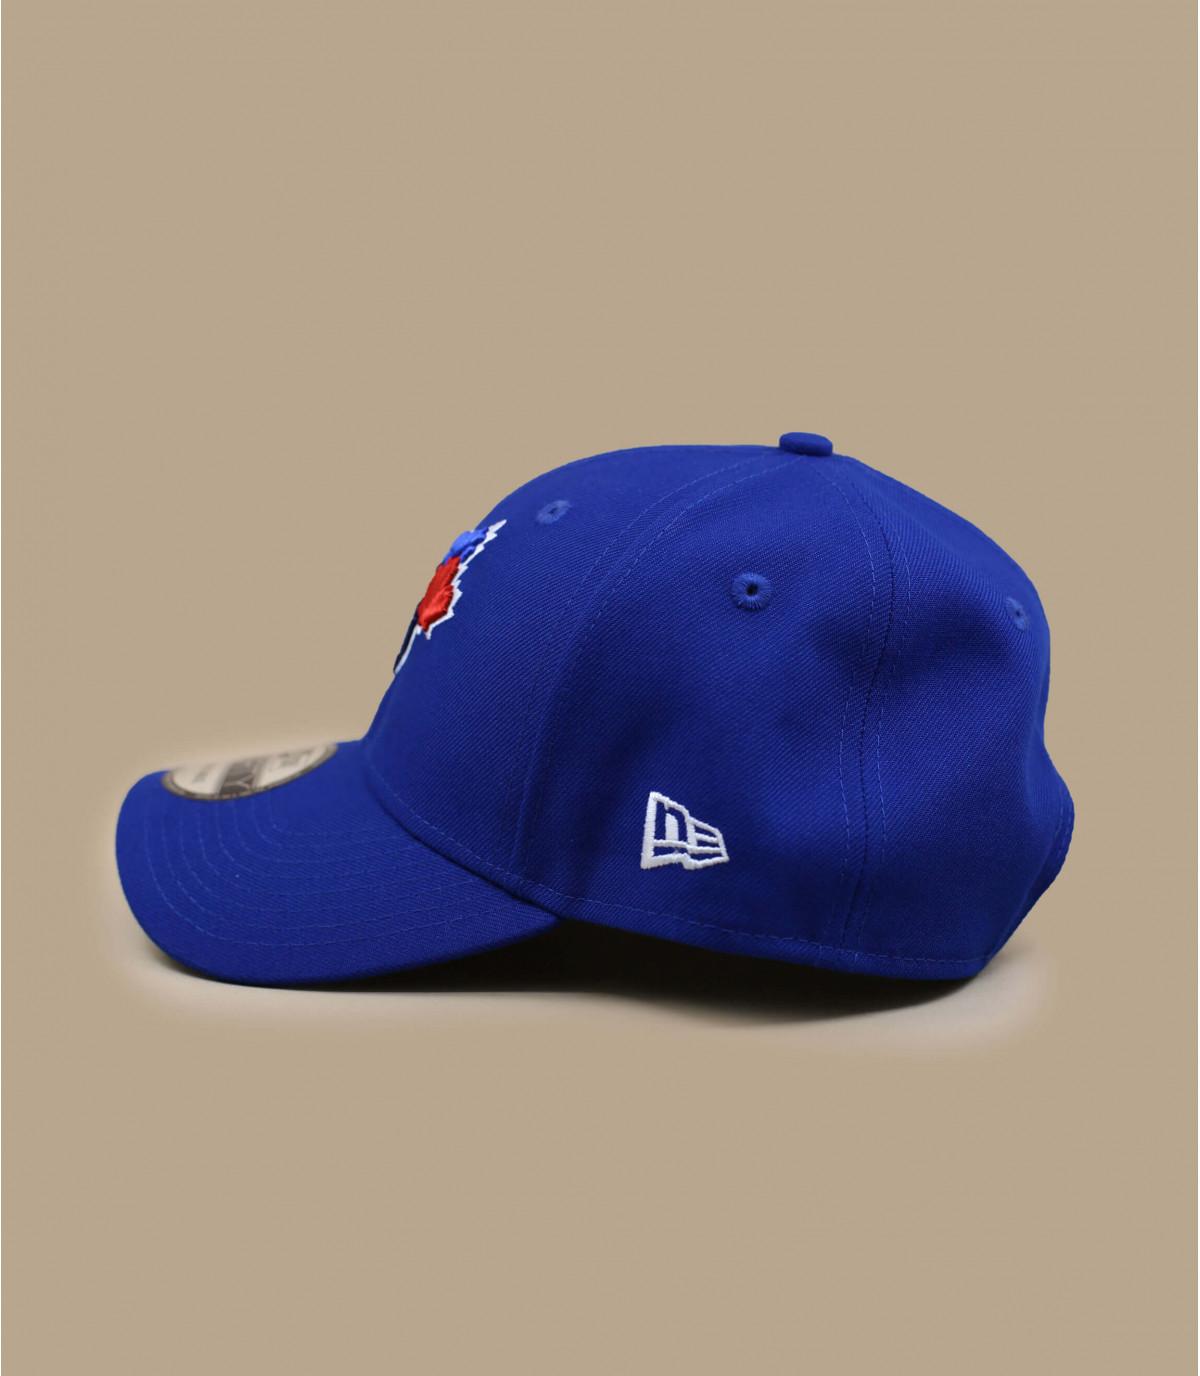 blue Toronto curve cap - Cap Toronto Blue Jays The League Team by ... 689310f28b5